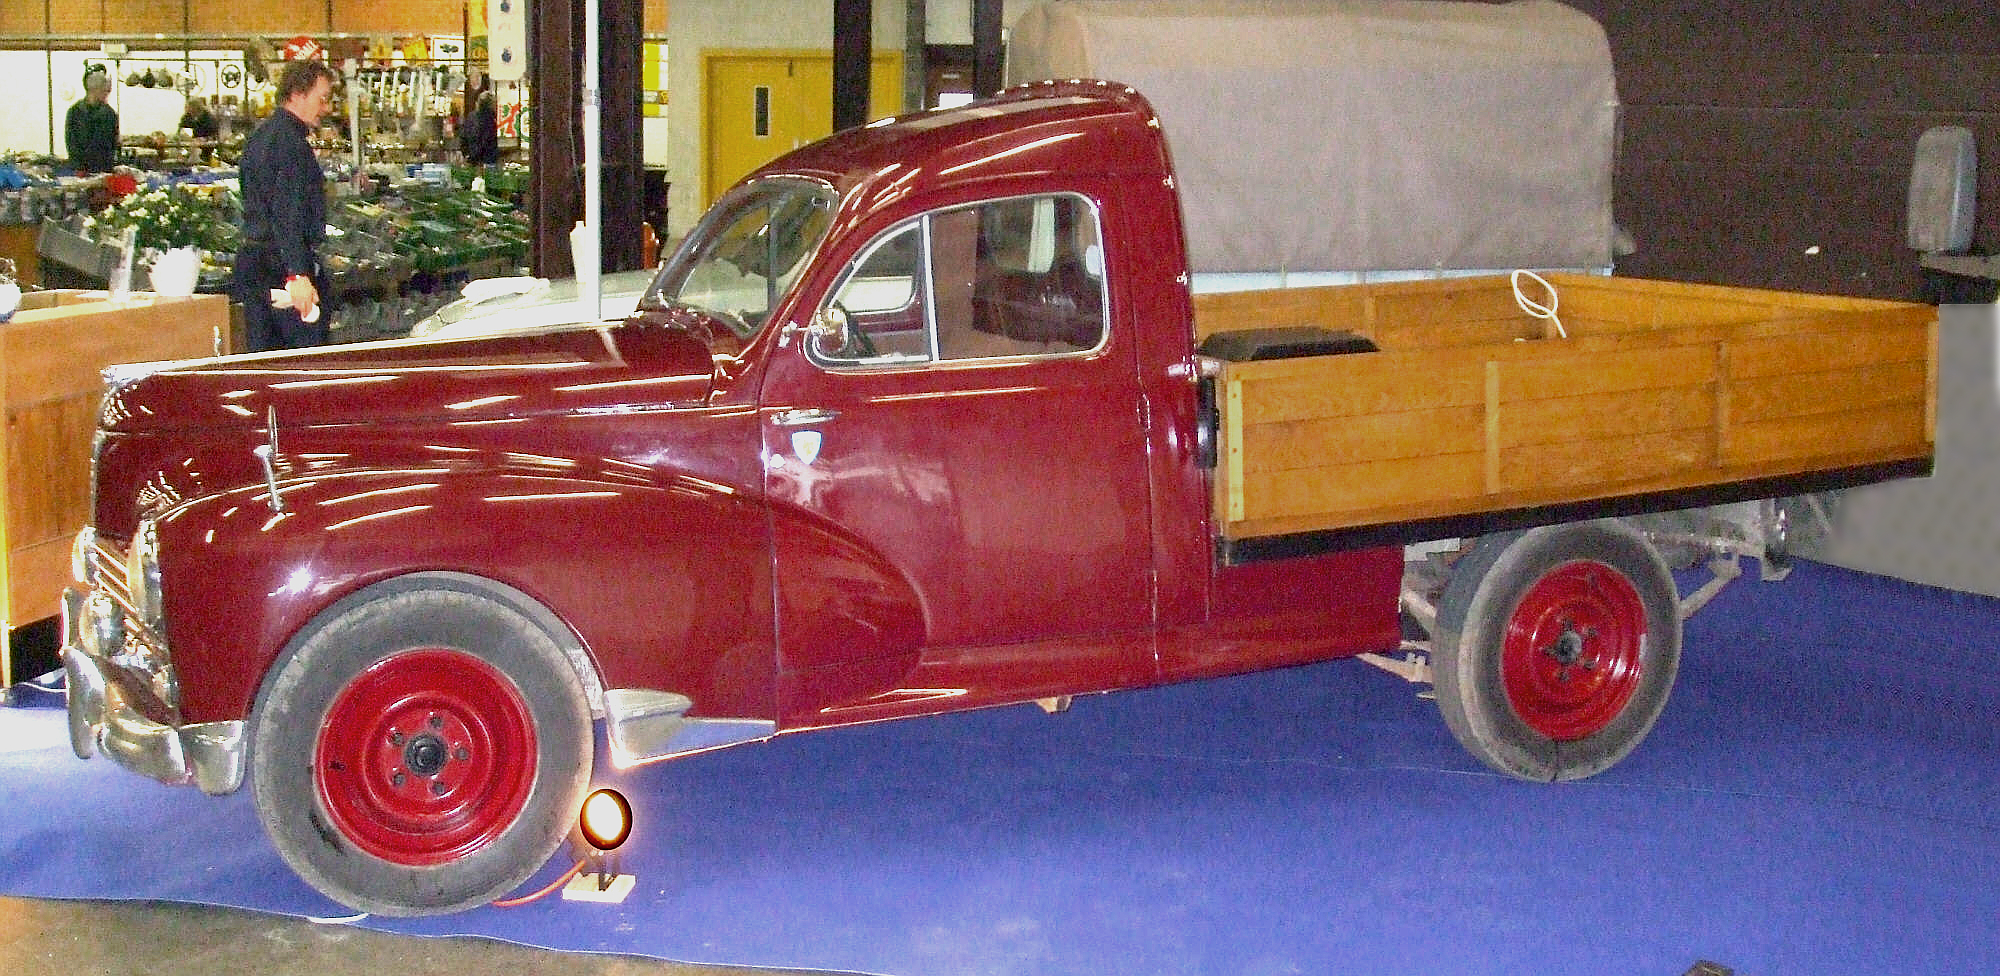 203 Pick Up Custom Fn31 Jornalagora